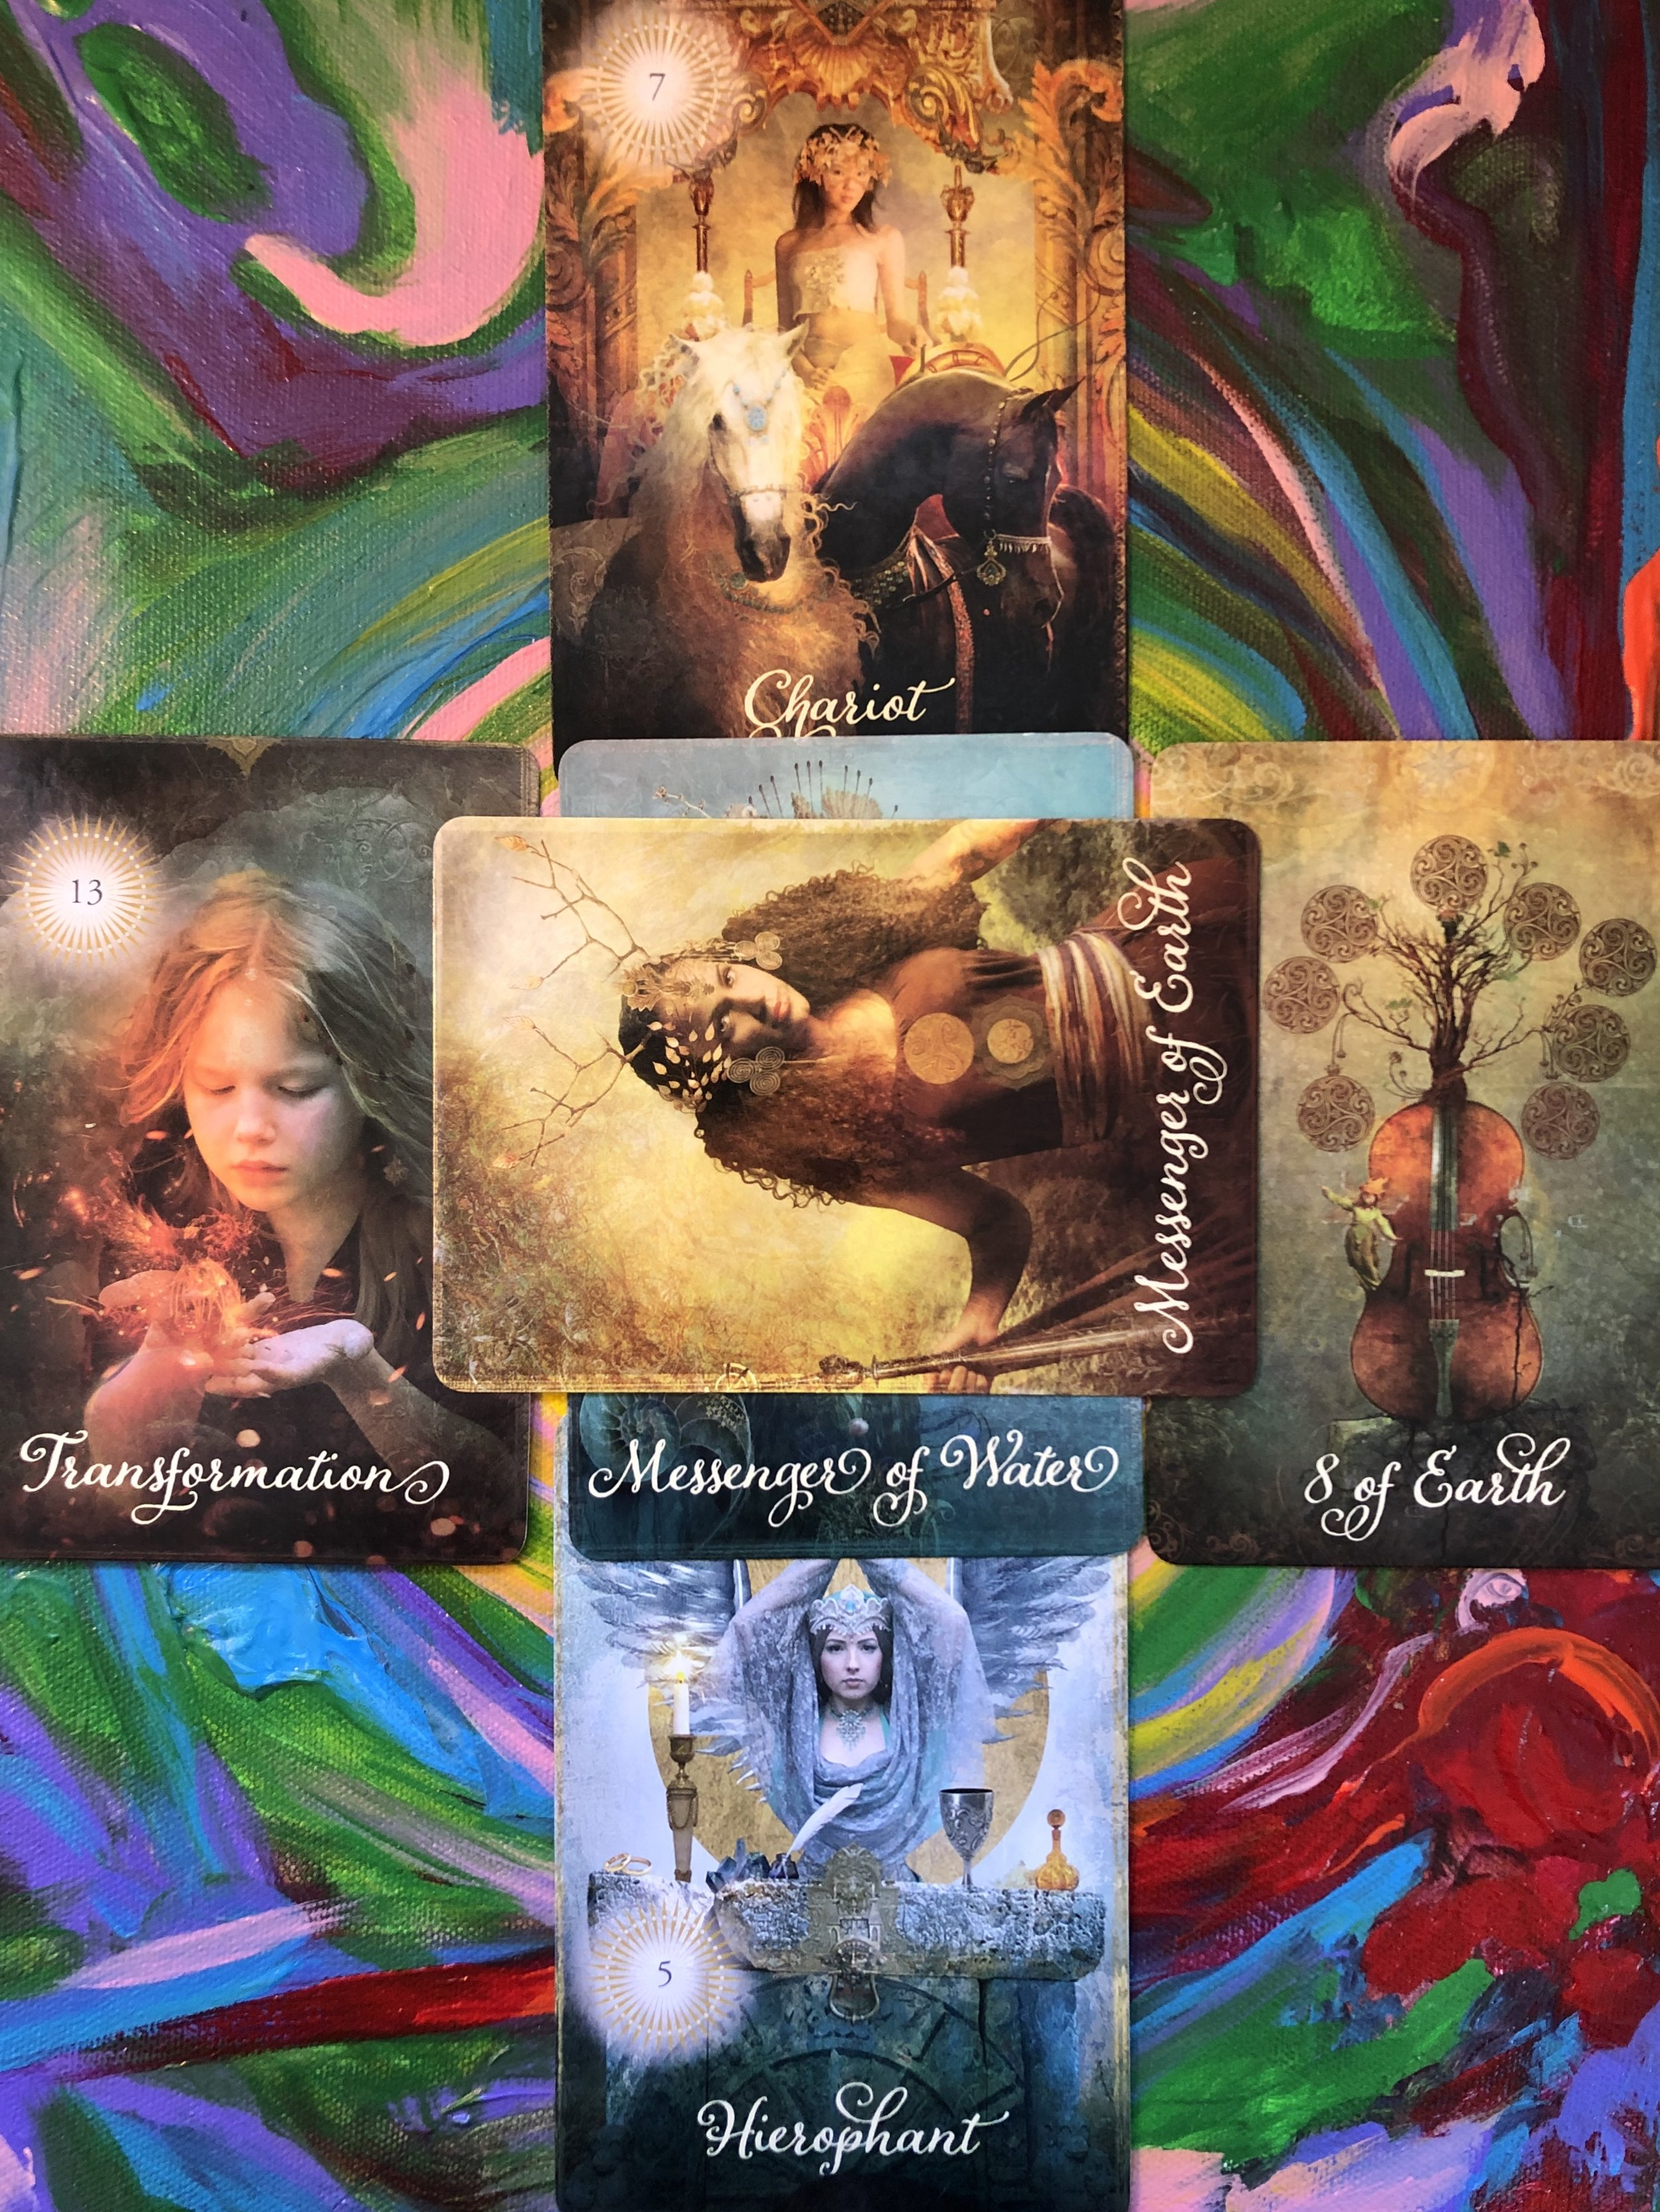 The Good Tarot/ Artwork by Crystal Mays at www.crystalmays.com